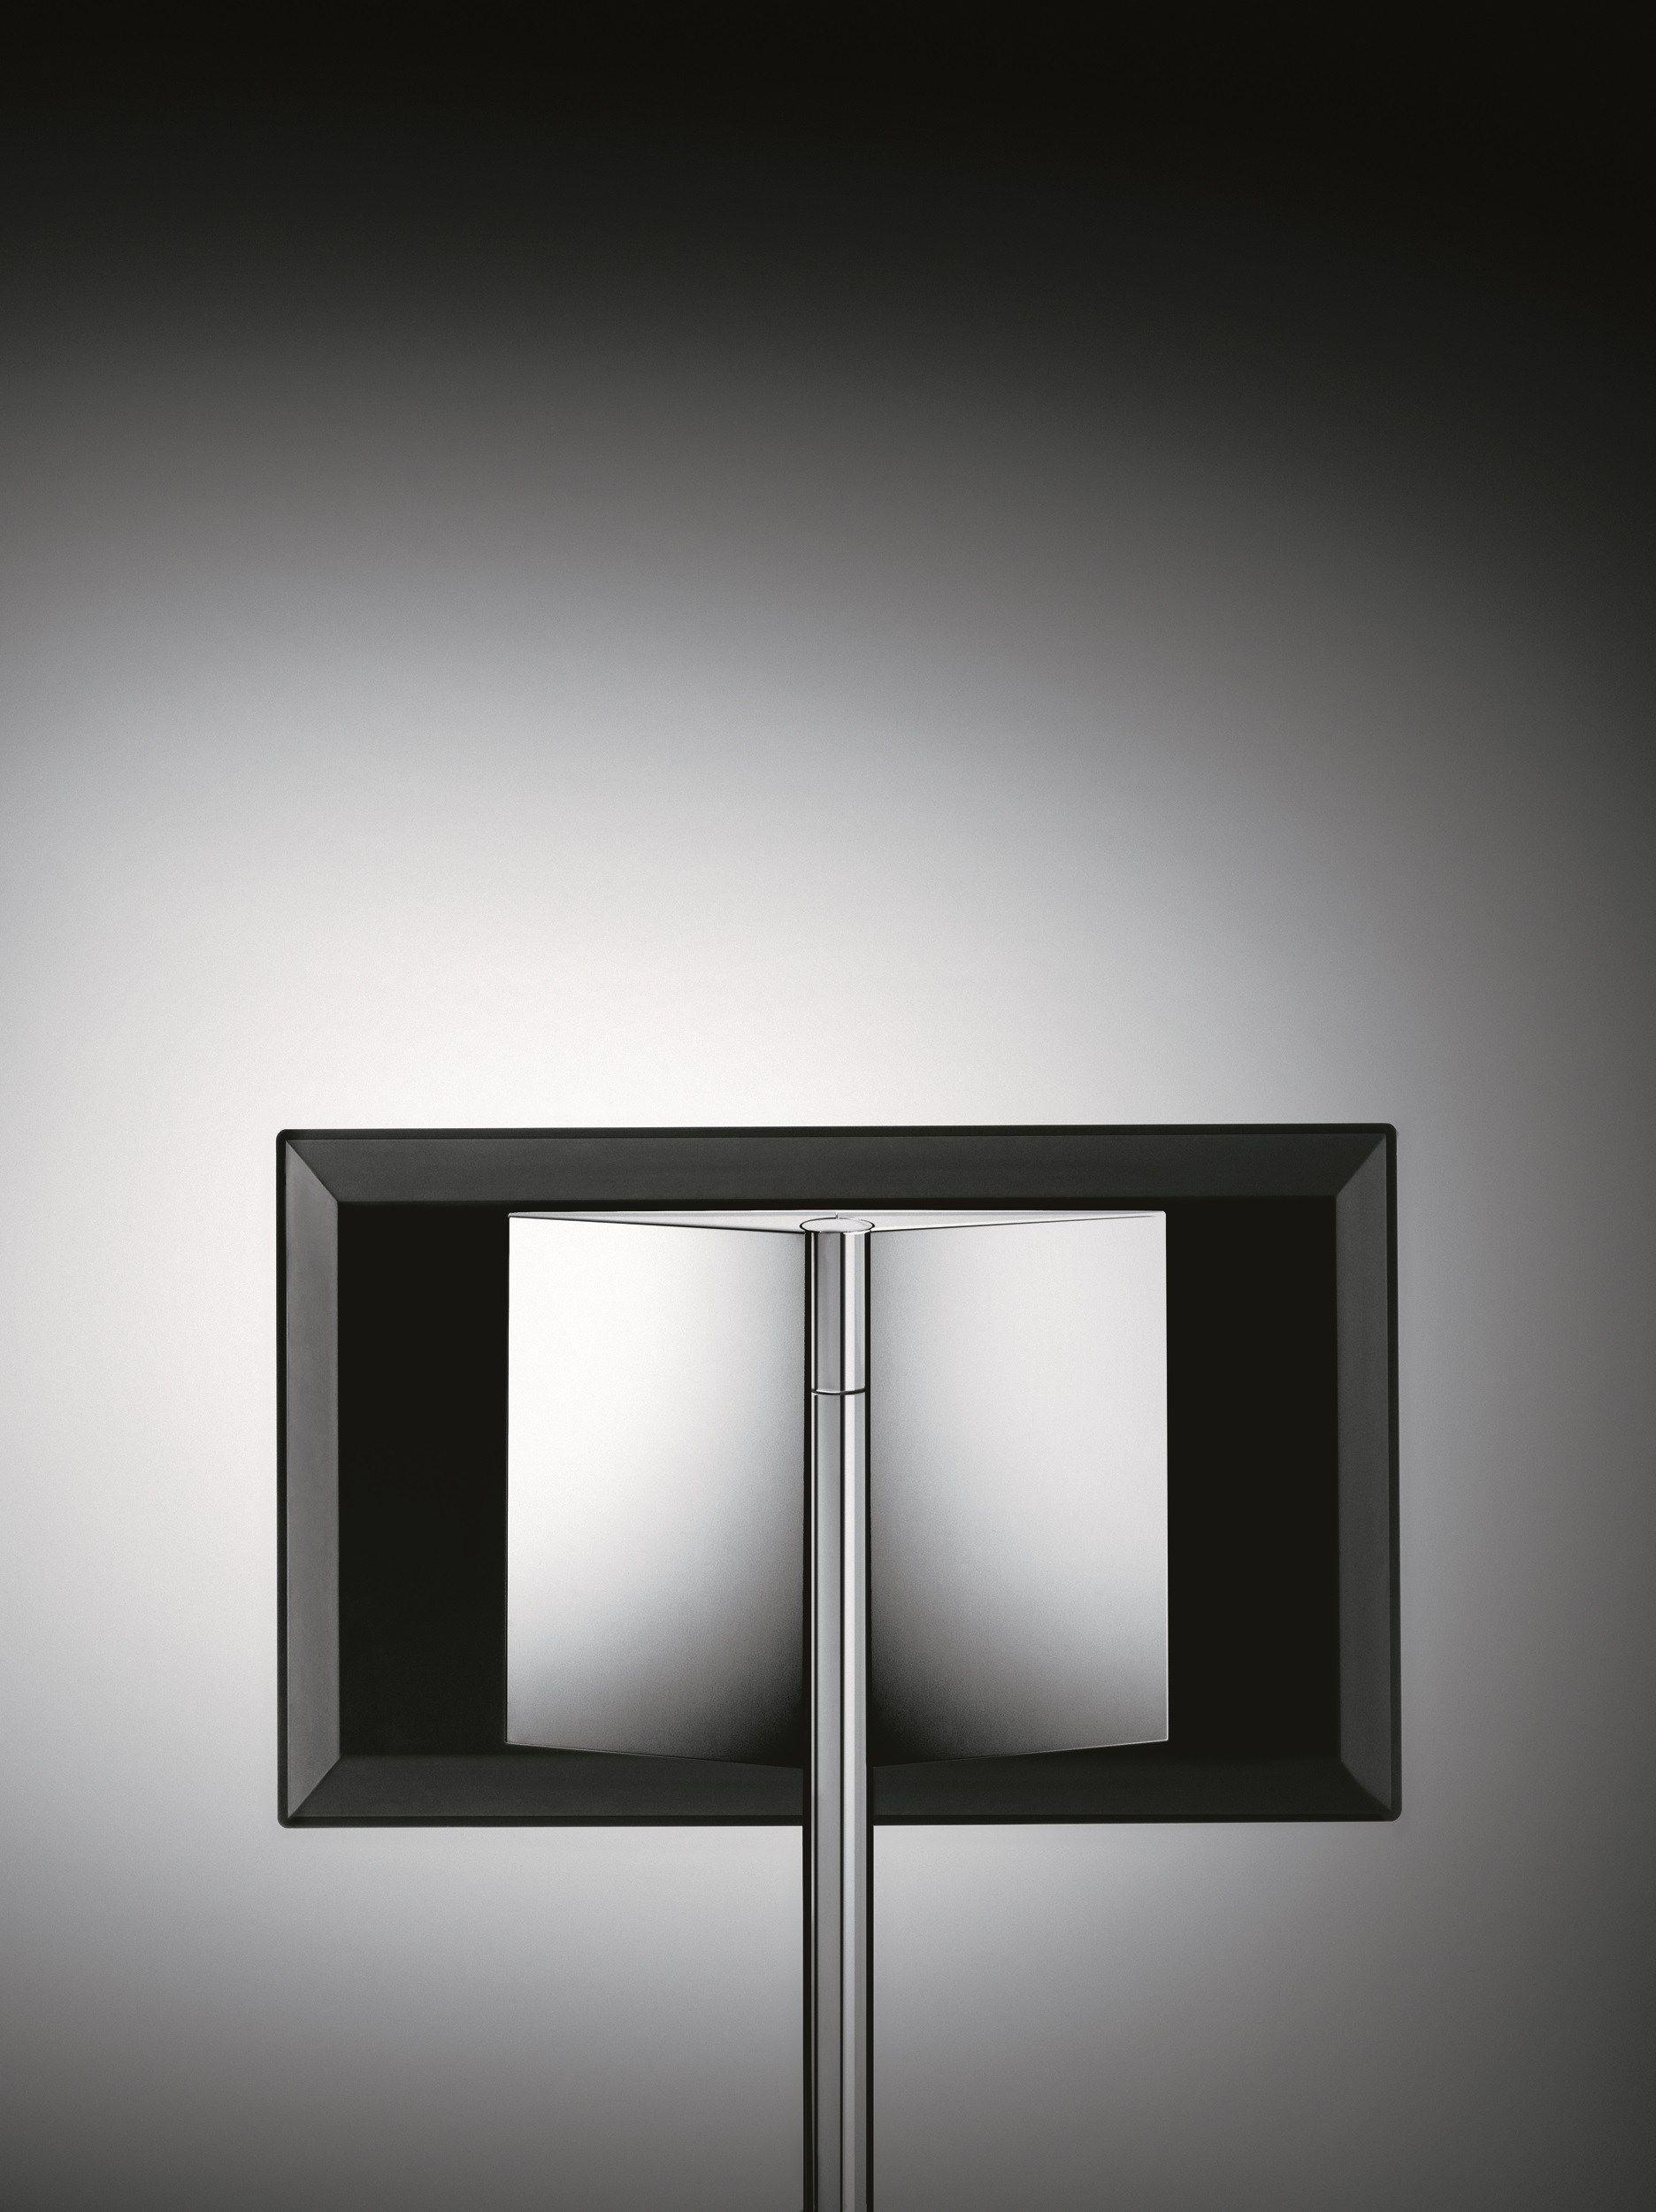 Mueble Tv Giratorio De Metal Sail 301 By Desalto Dise O Caronni  # Mueble Soporte Tv Diseno